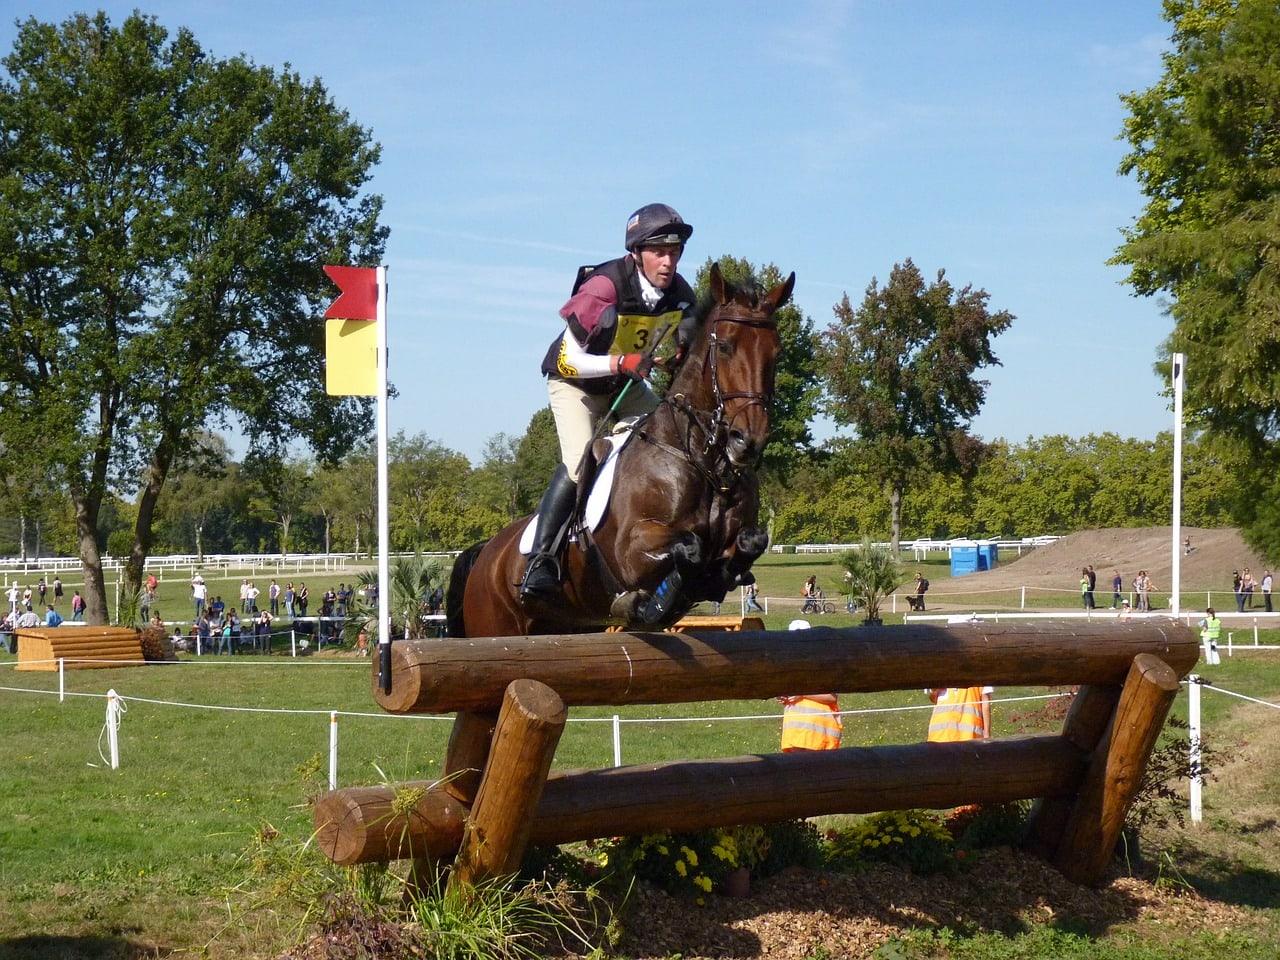 eventing horseback riding